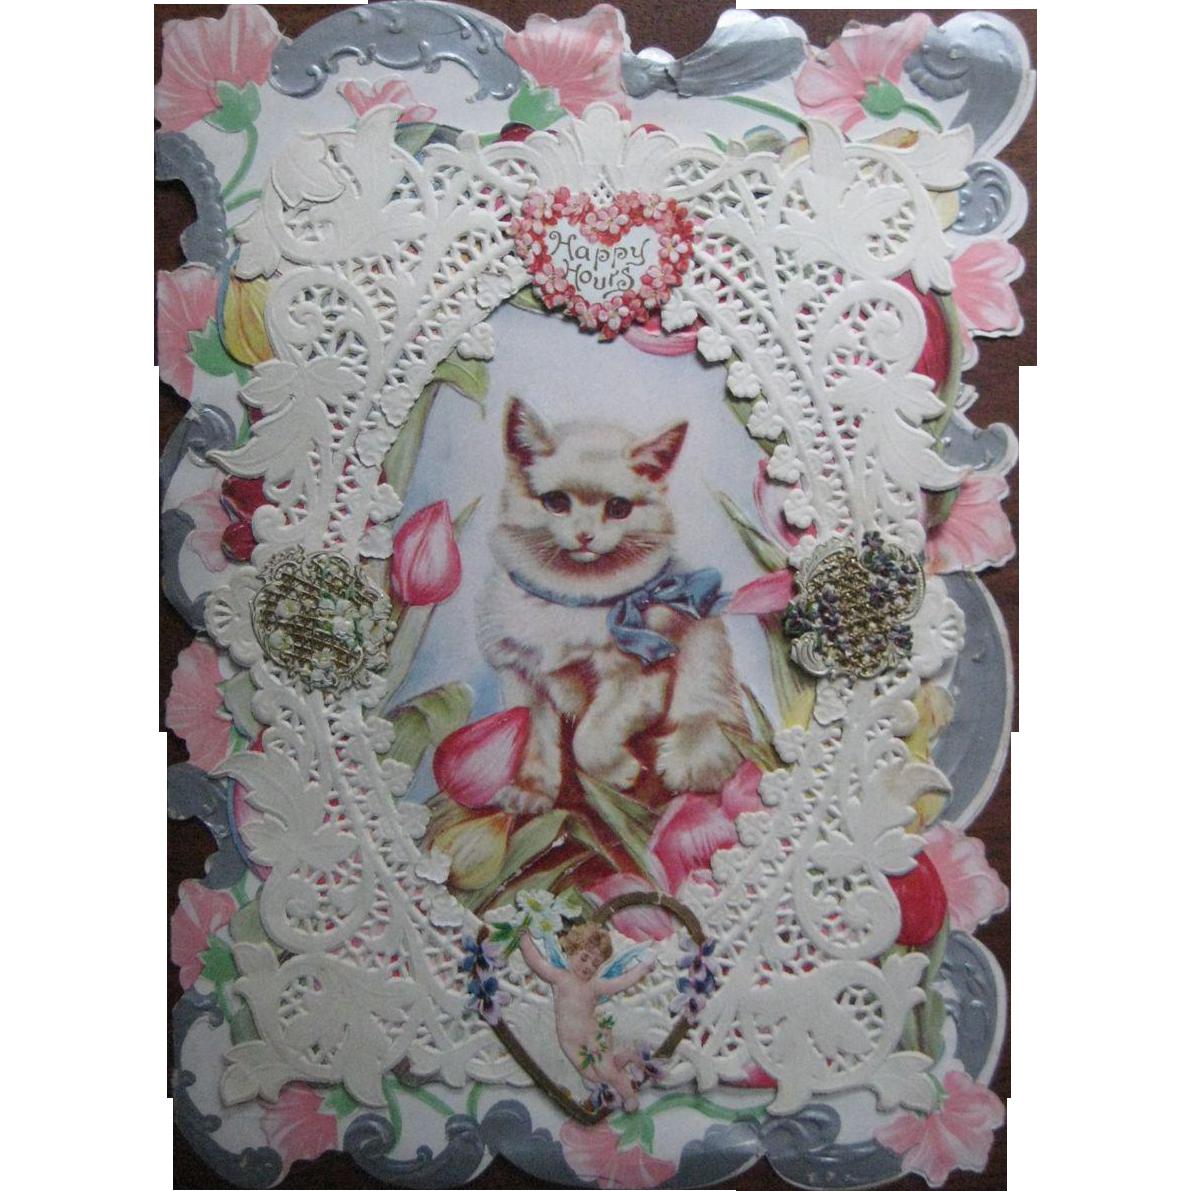 Cat Valentine's Day card